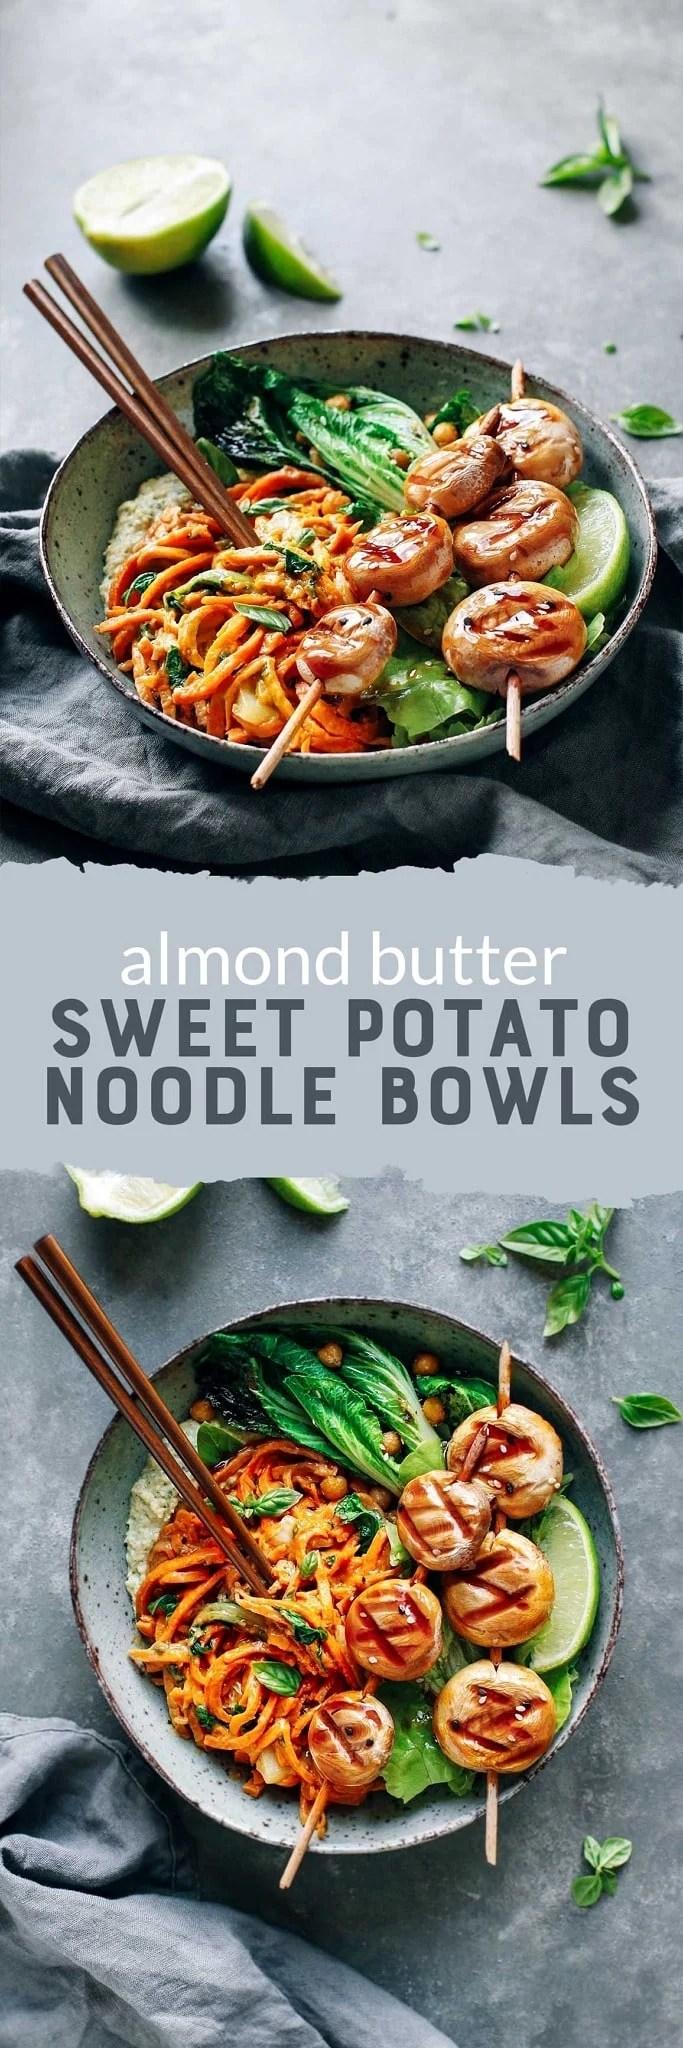 Almond Butter Sweet Potato Bowls